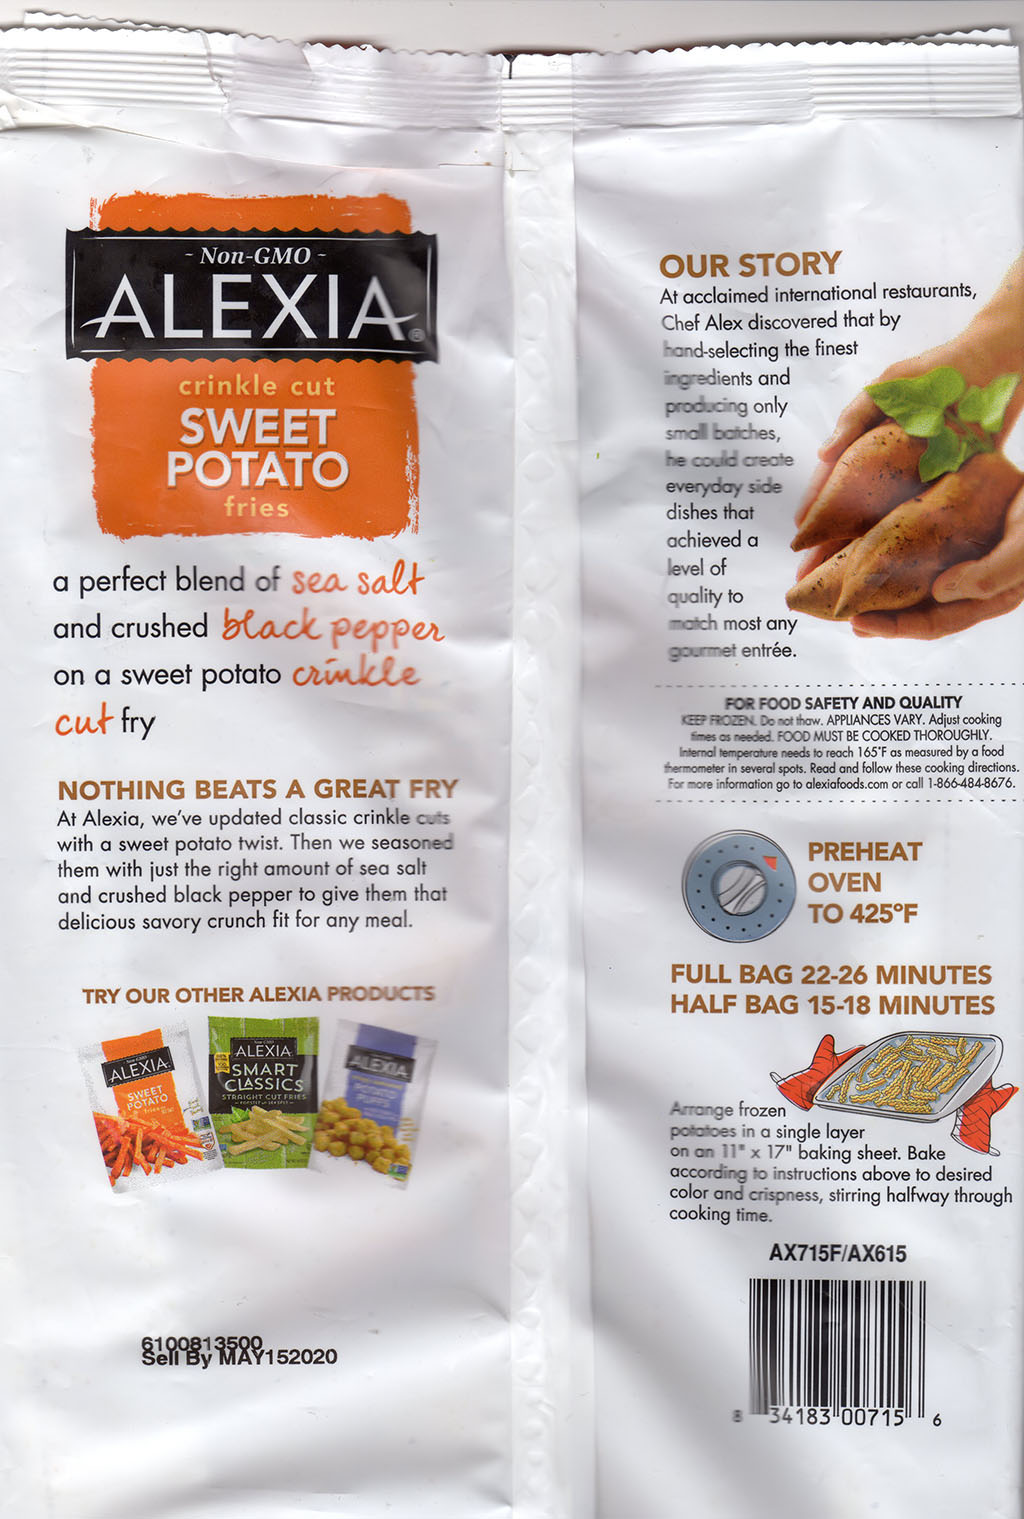 Alexia Crinkle Cut Sweet Potato Fries package rear